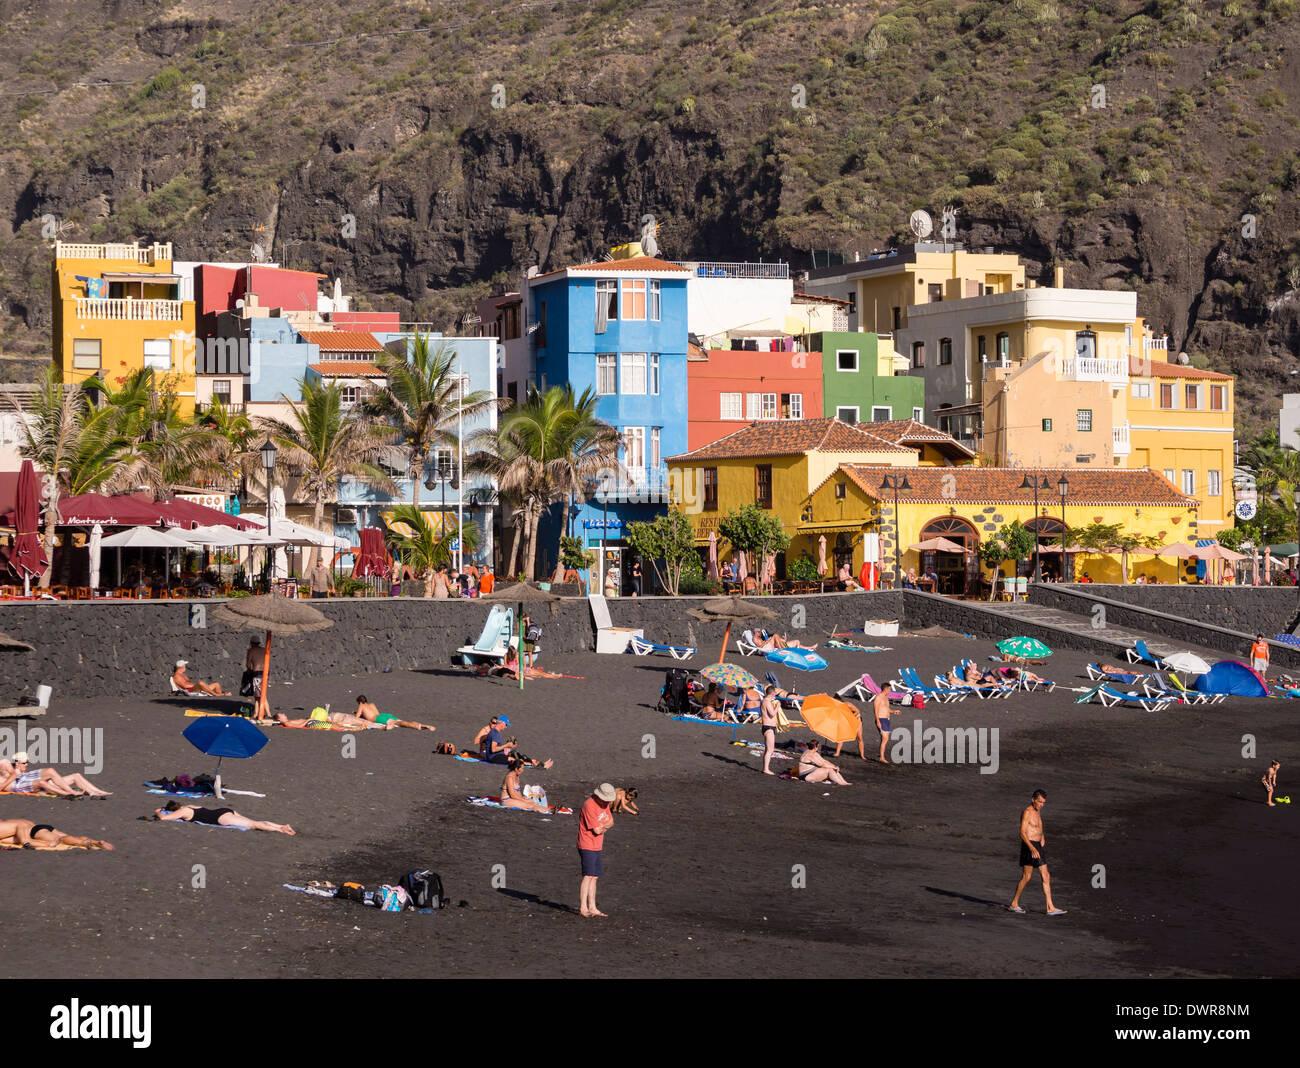 The dark black sand beach of Puerto de Tazacorte on the Canary Island of La Palma. - Stock Image